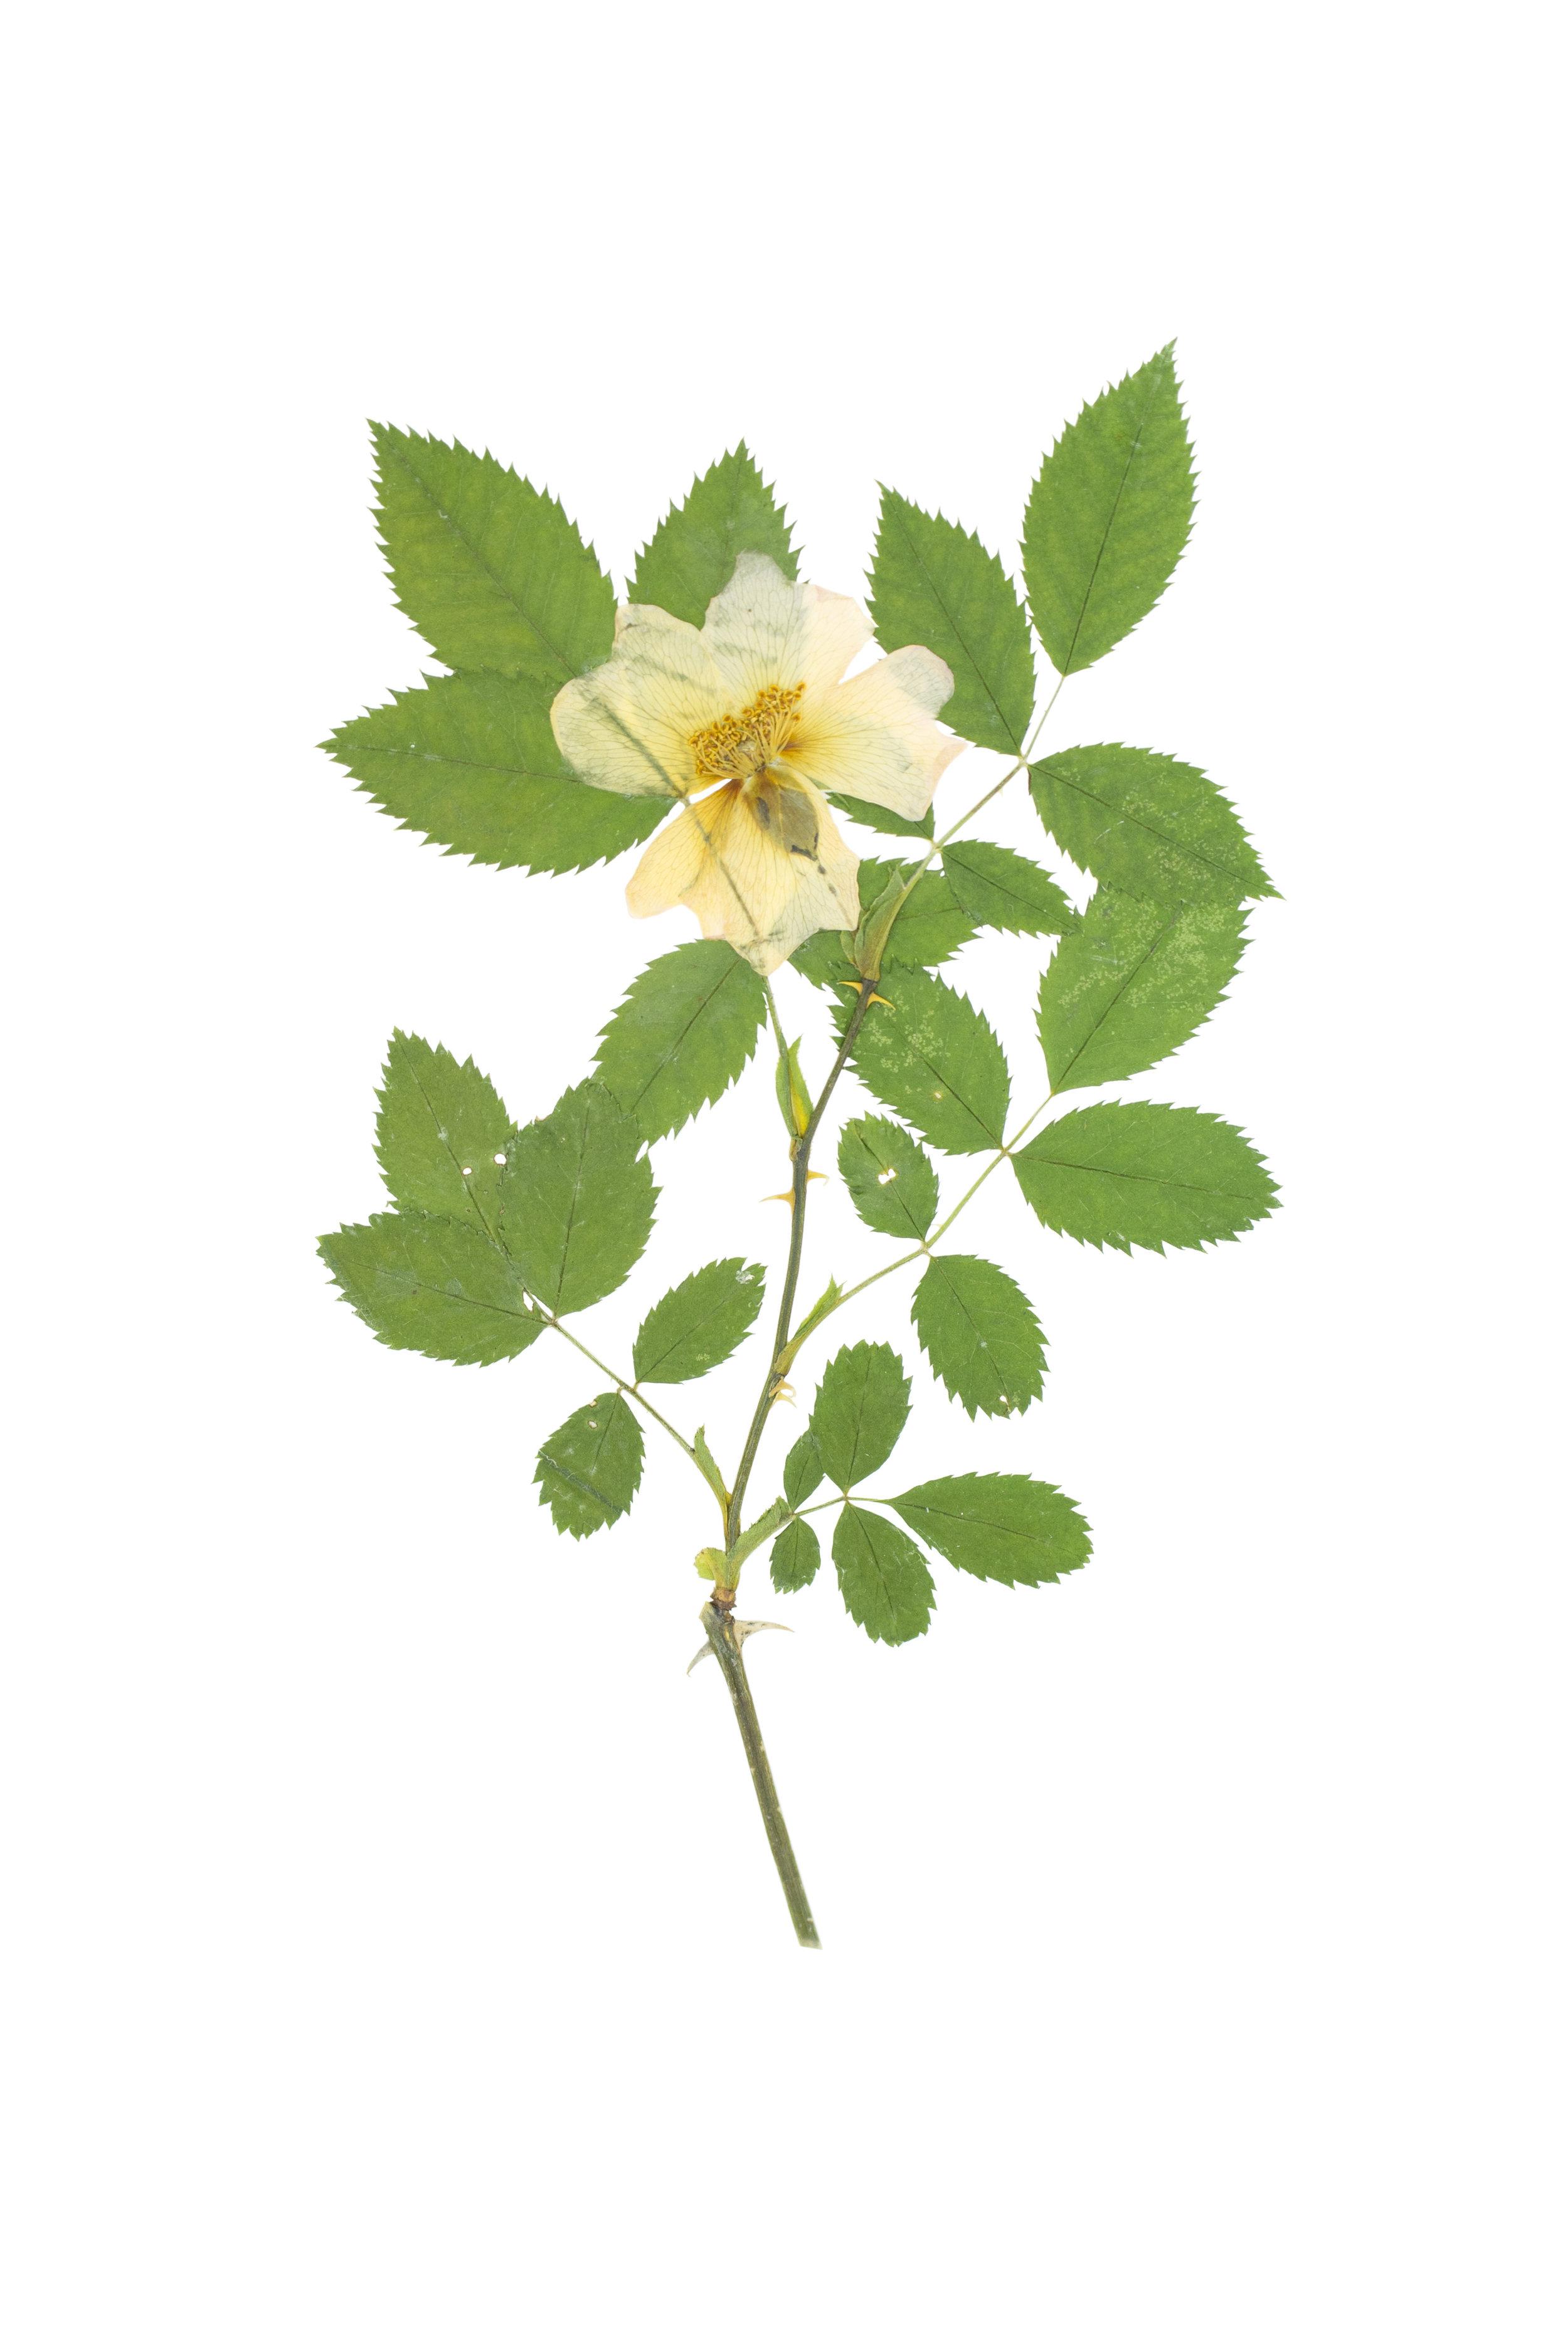 Field Rose / Rosa arvensis